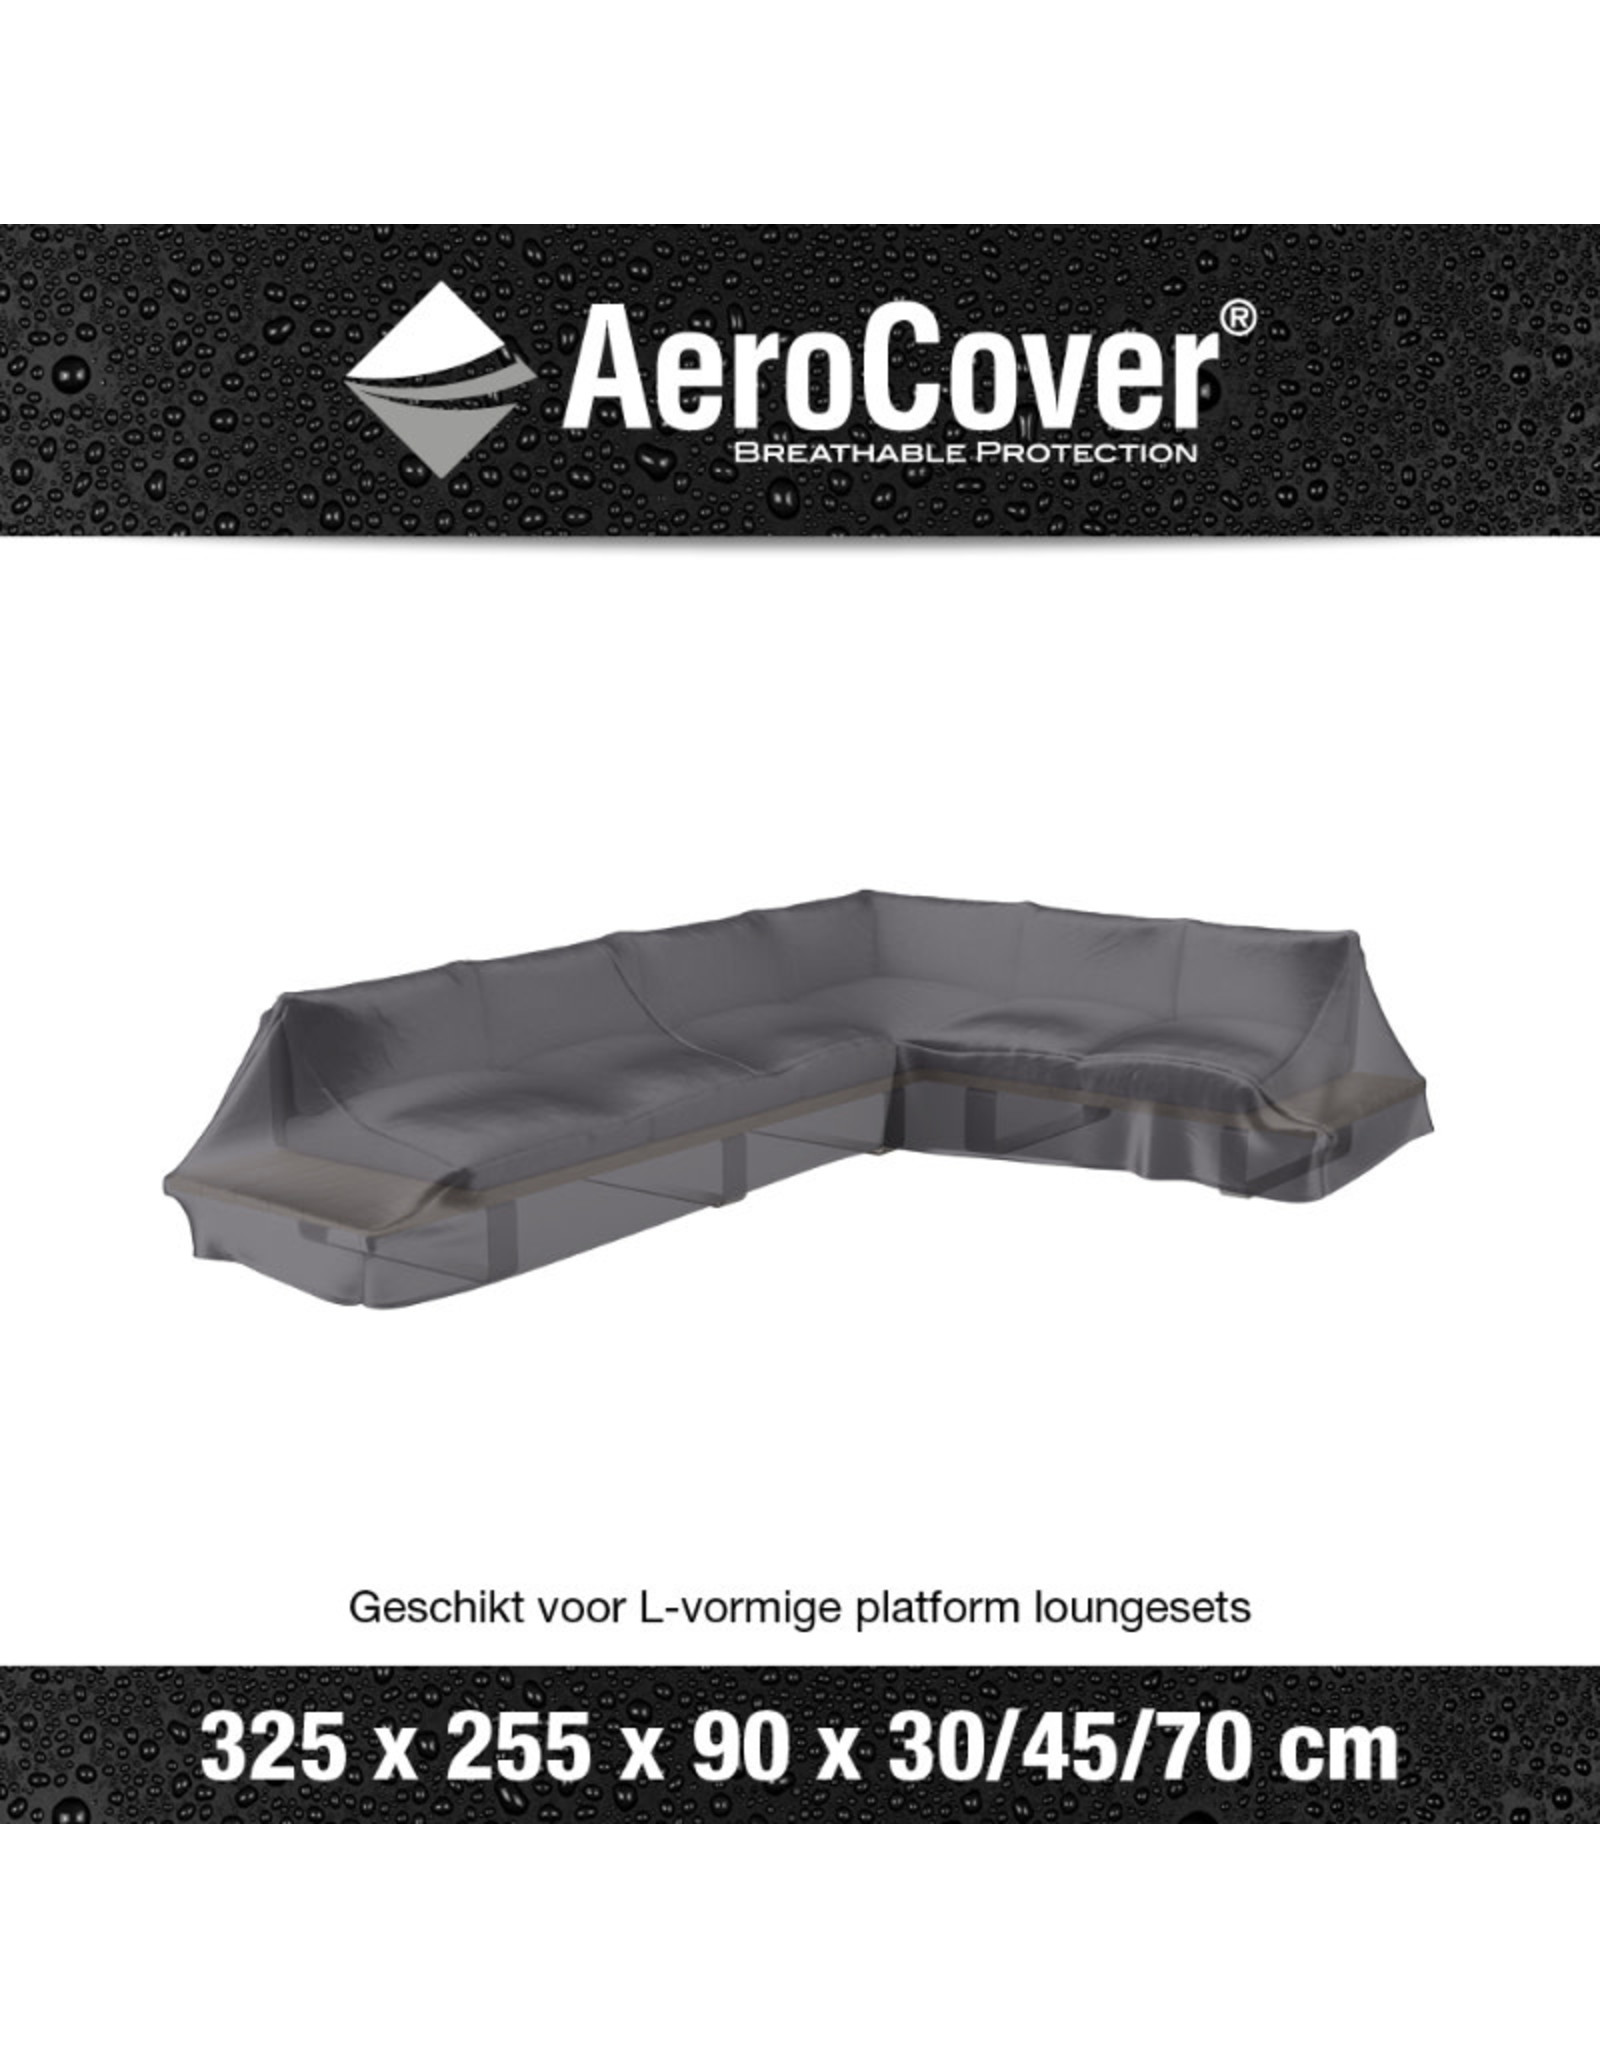 Aerocover  AeroCover Lounge set platform cover right 325x255x90xH30-45-70